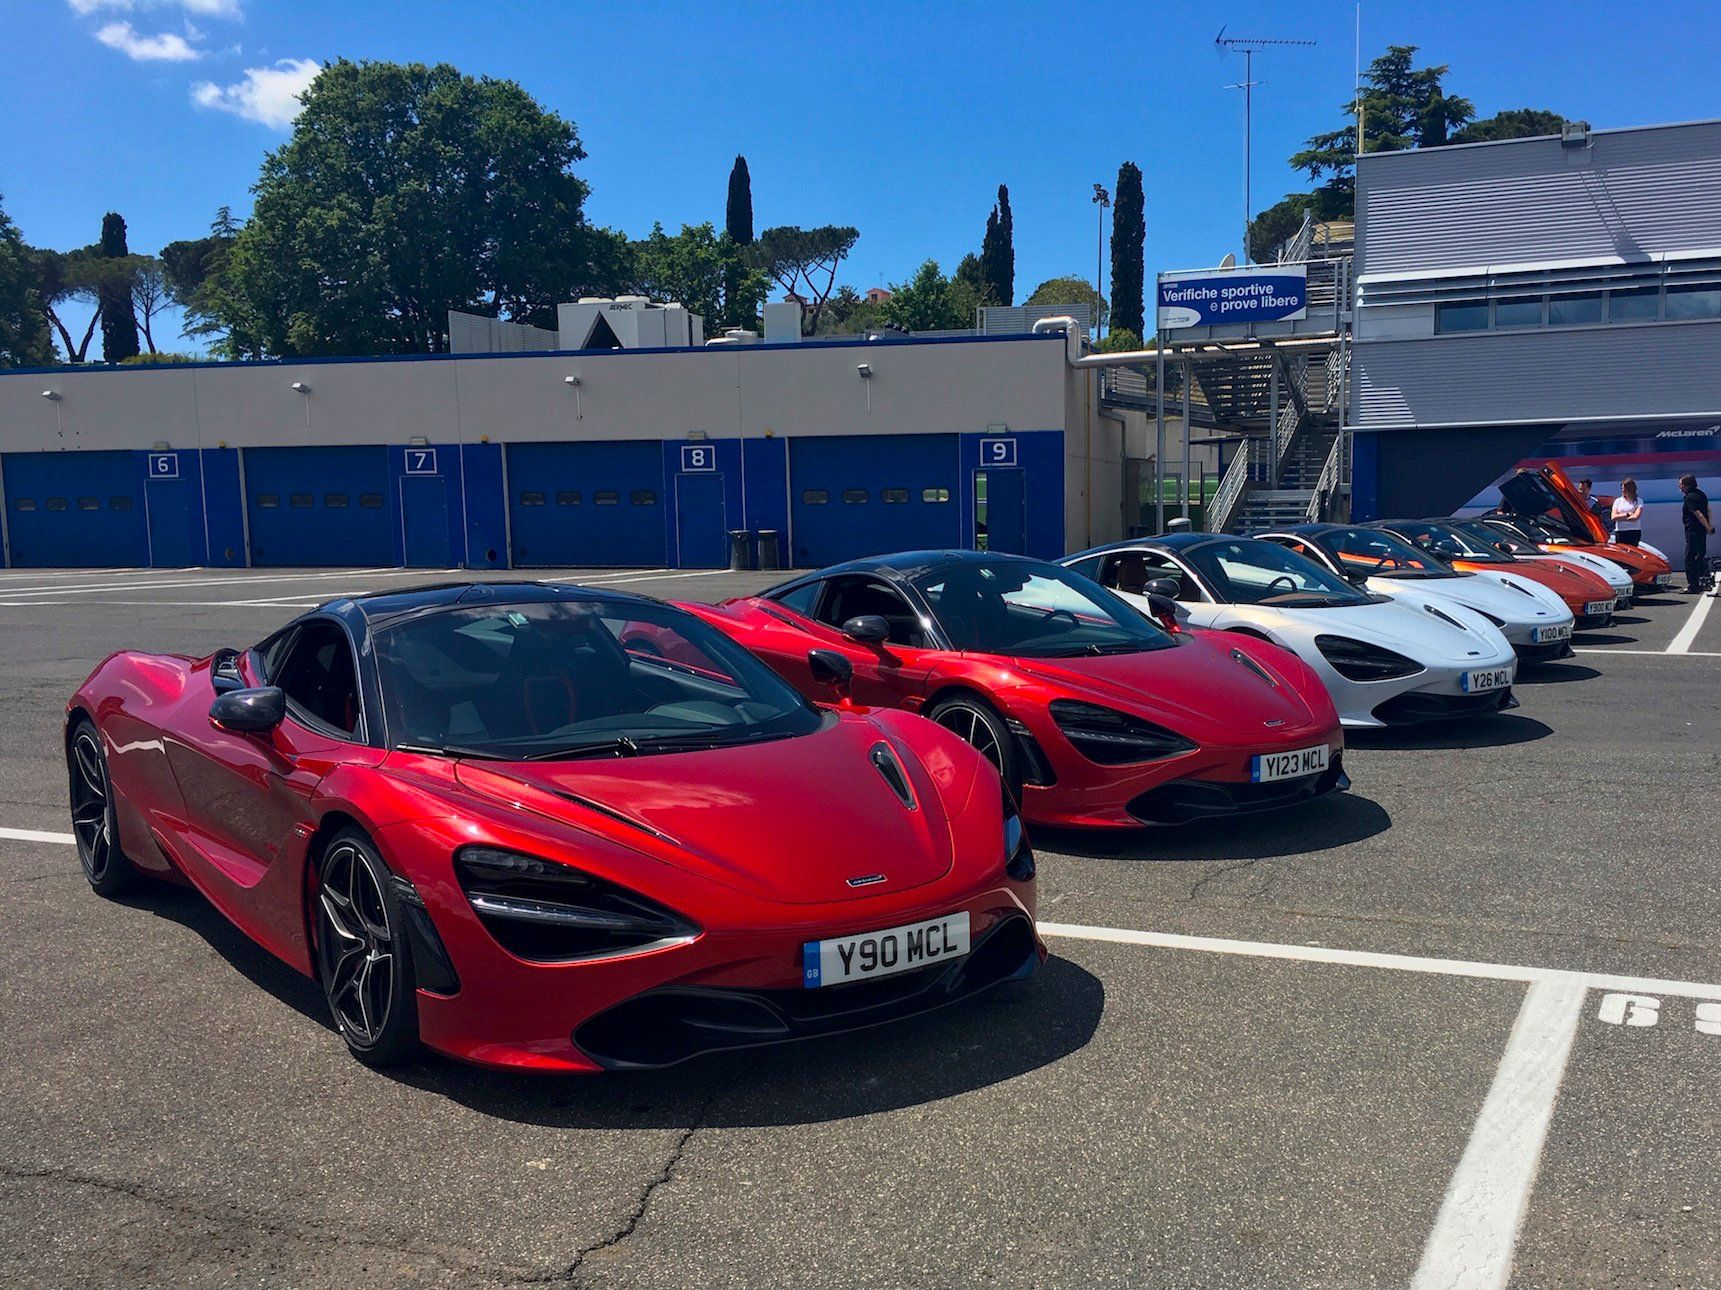 Mclaren 720s Supercar Review Pictures Supercar Design Super Cars Ferrari 2017